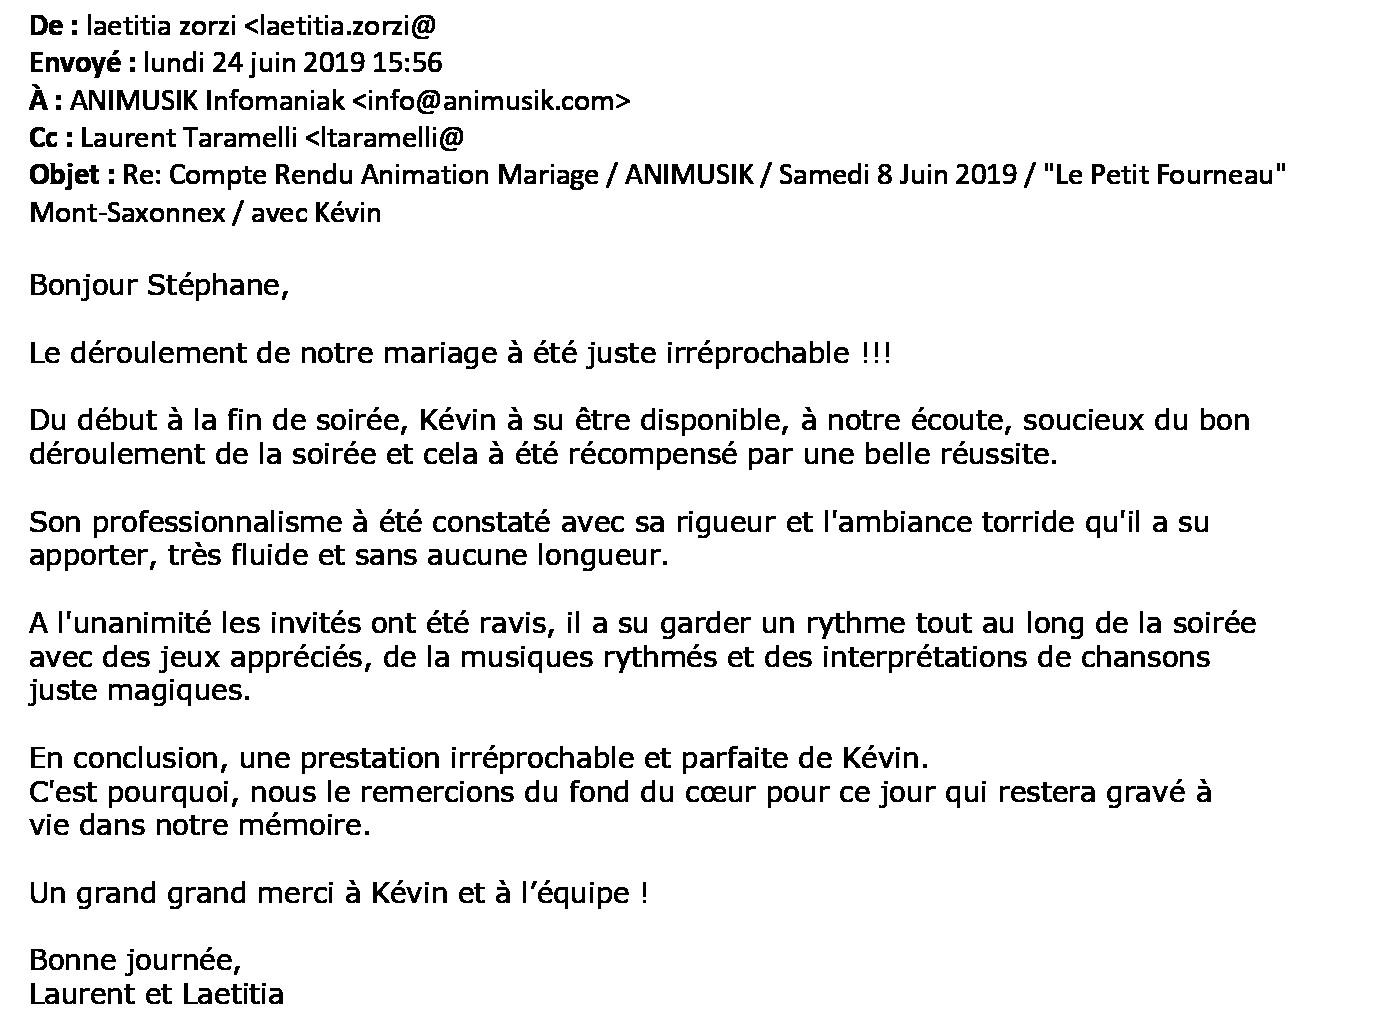 Mariage-TARAMELLI-Laurent-_-ZORZI-Laetit